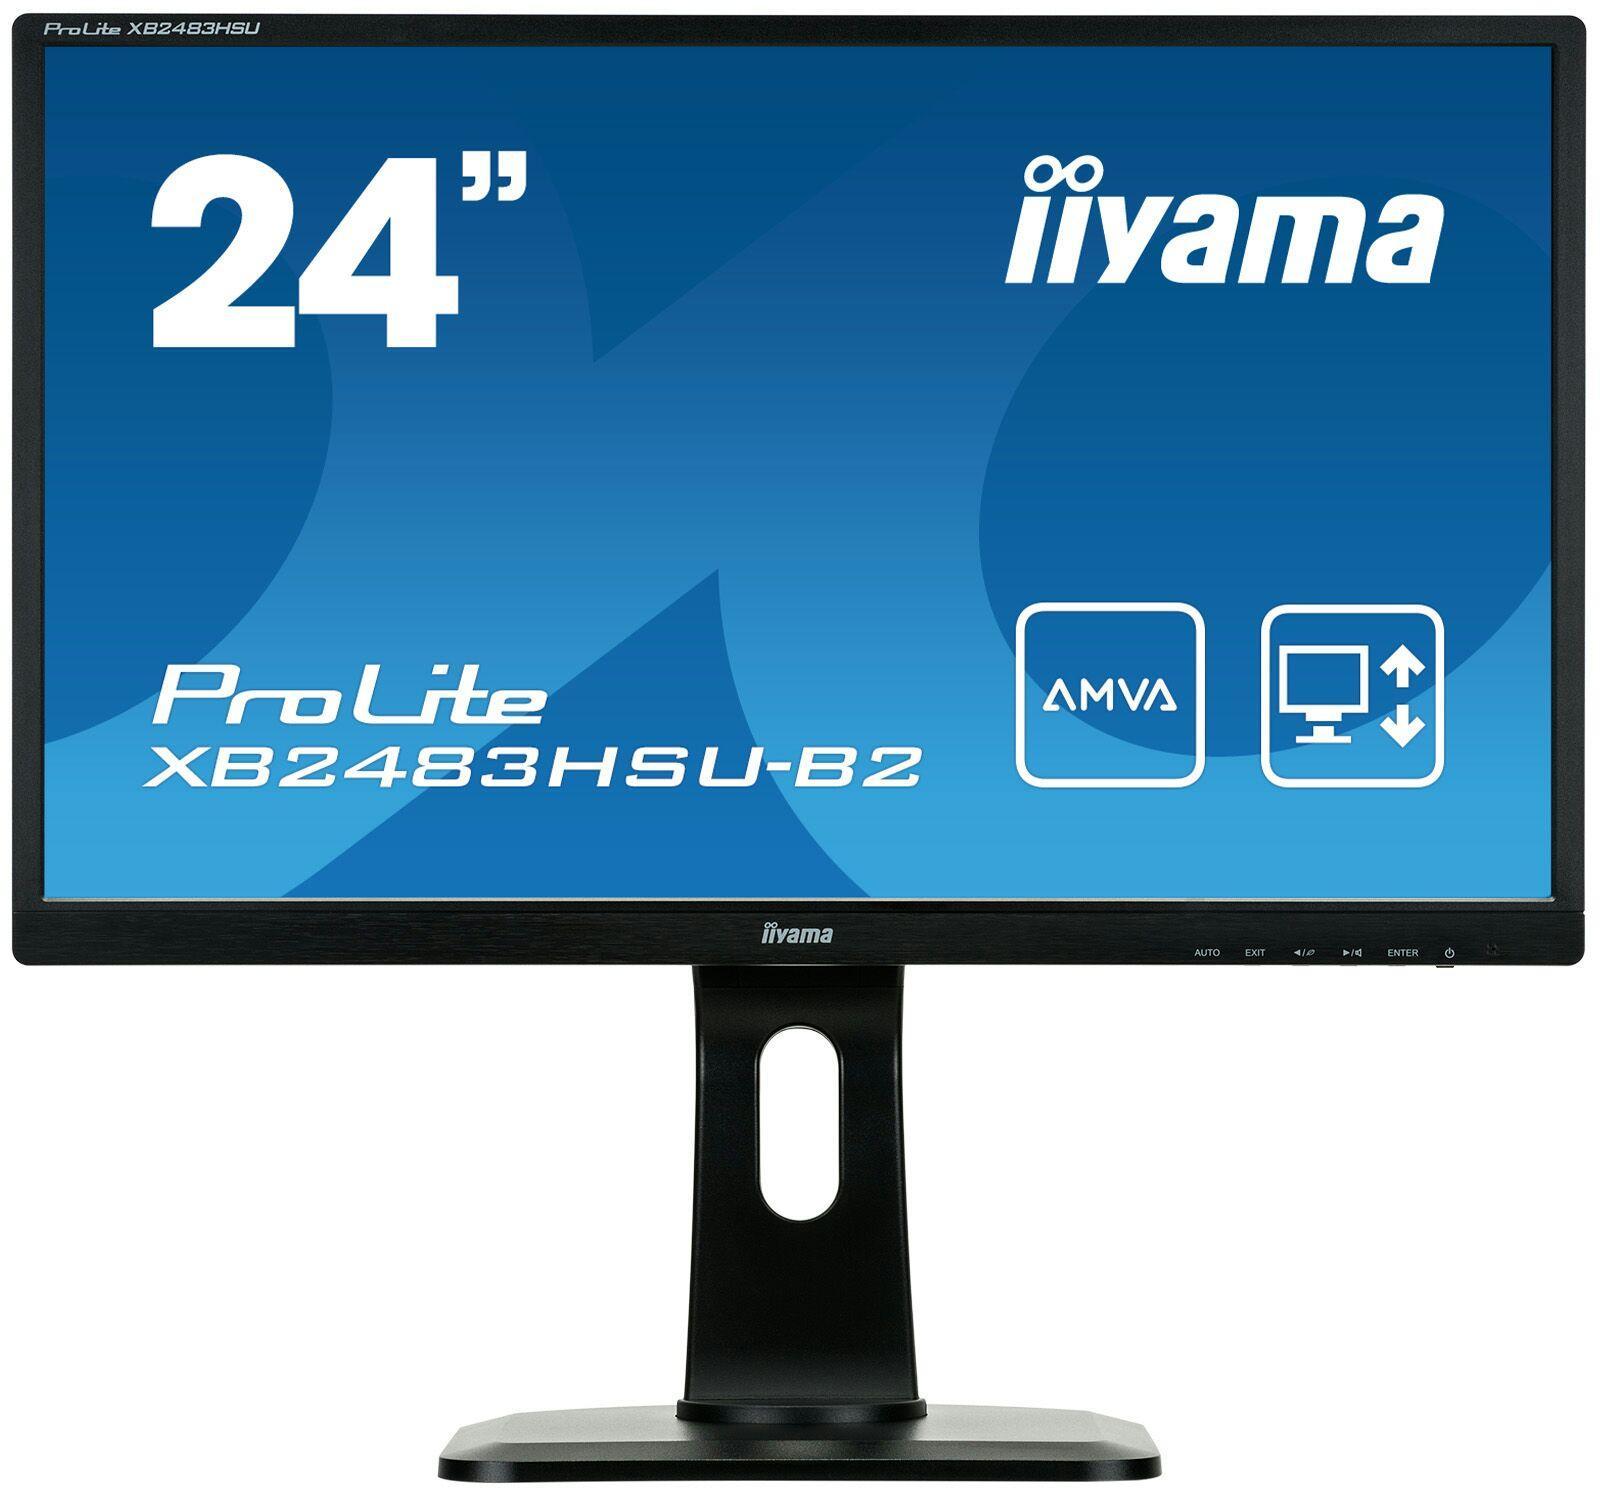 "Ecran PC 24"" Iiyama ProLite XB2483HSU-B2 - Full HD, AMVA+ (Via applications mobiles)"